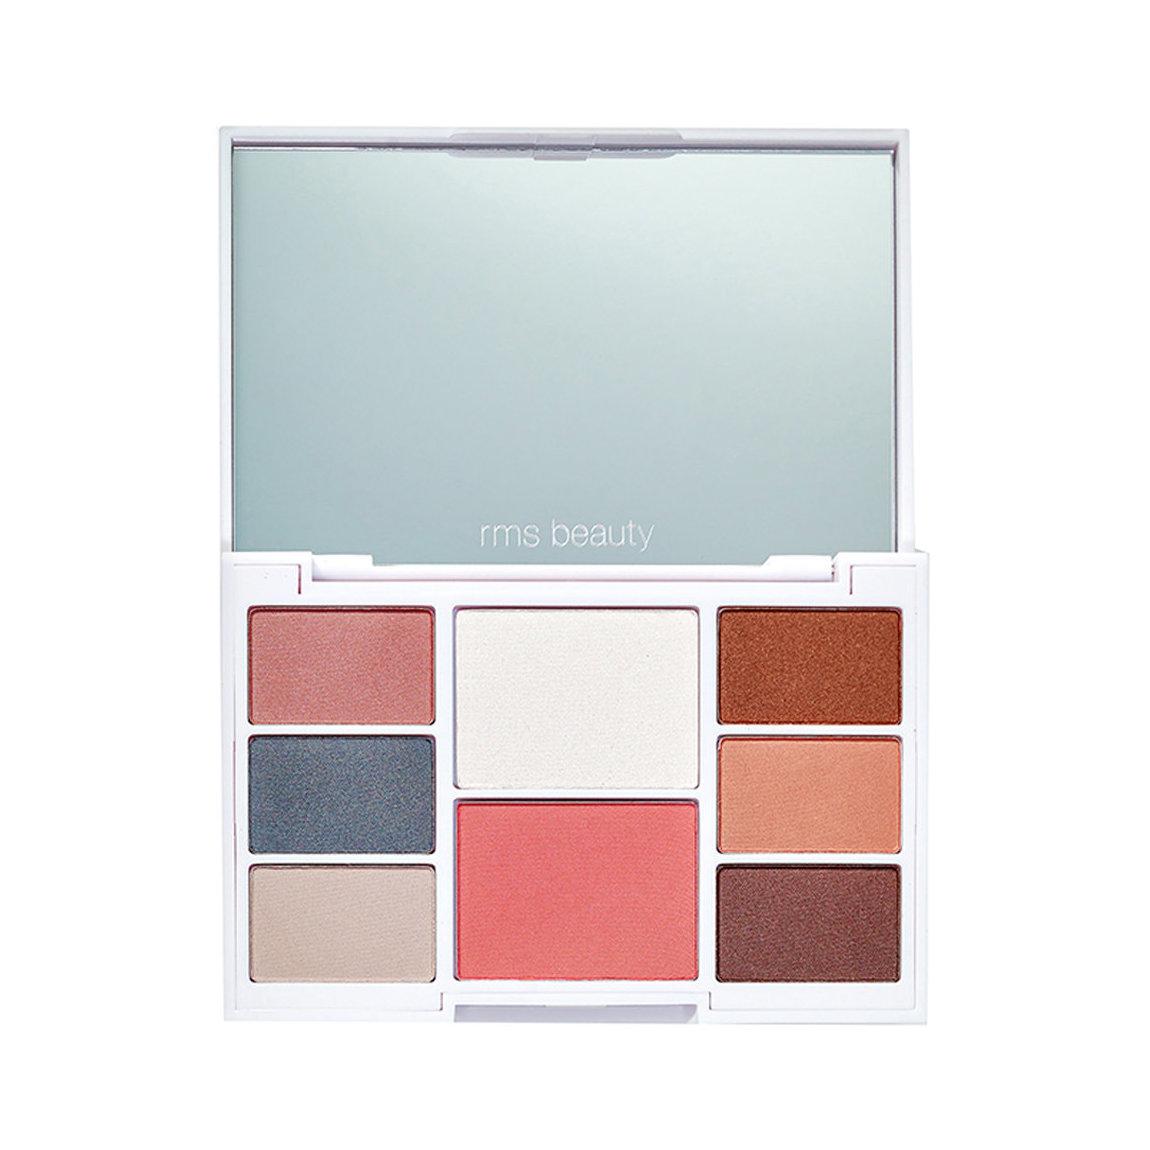 rms beauty Hidden Desire Palette product swatch.